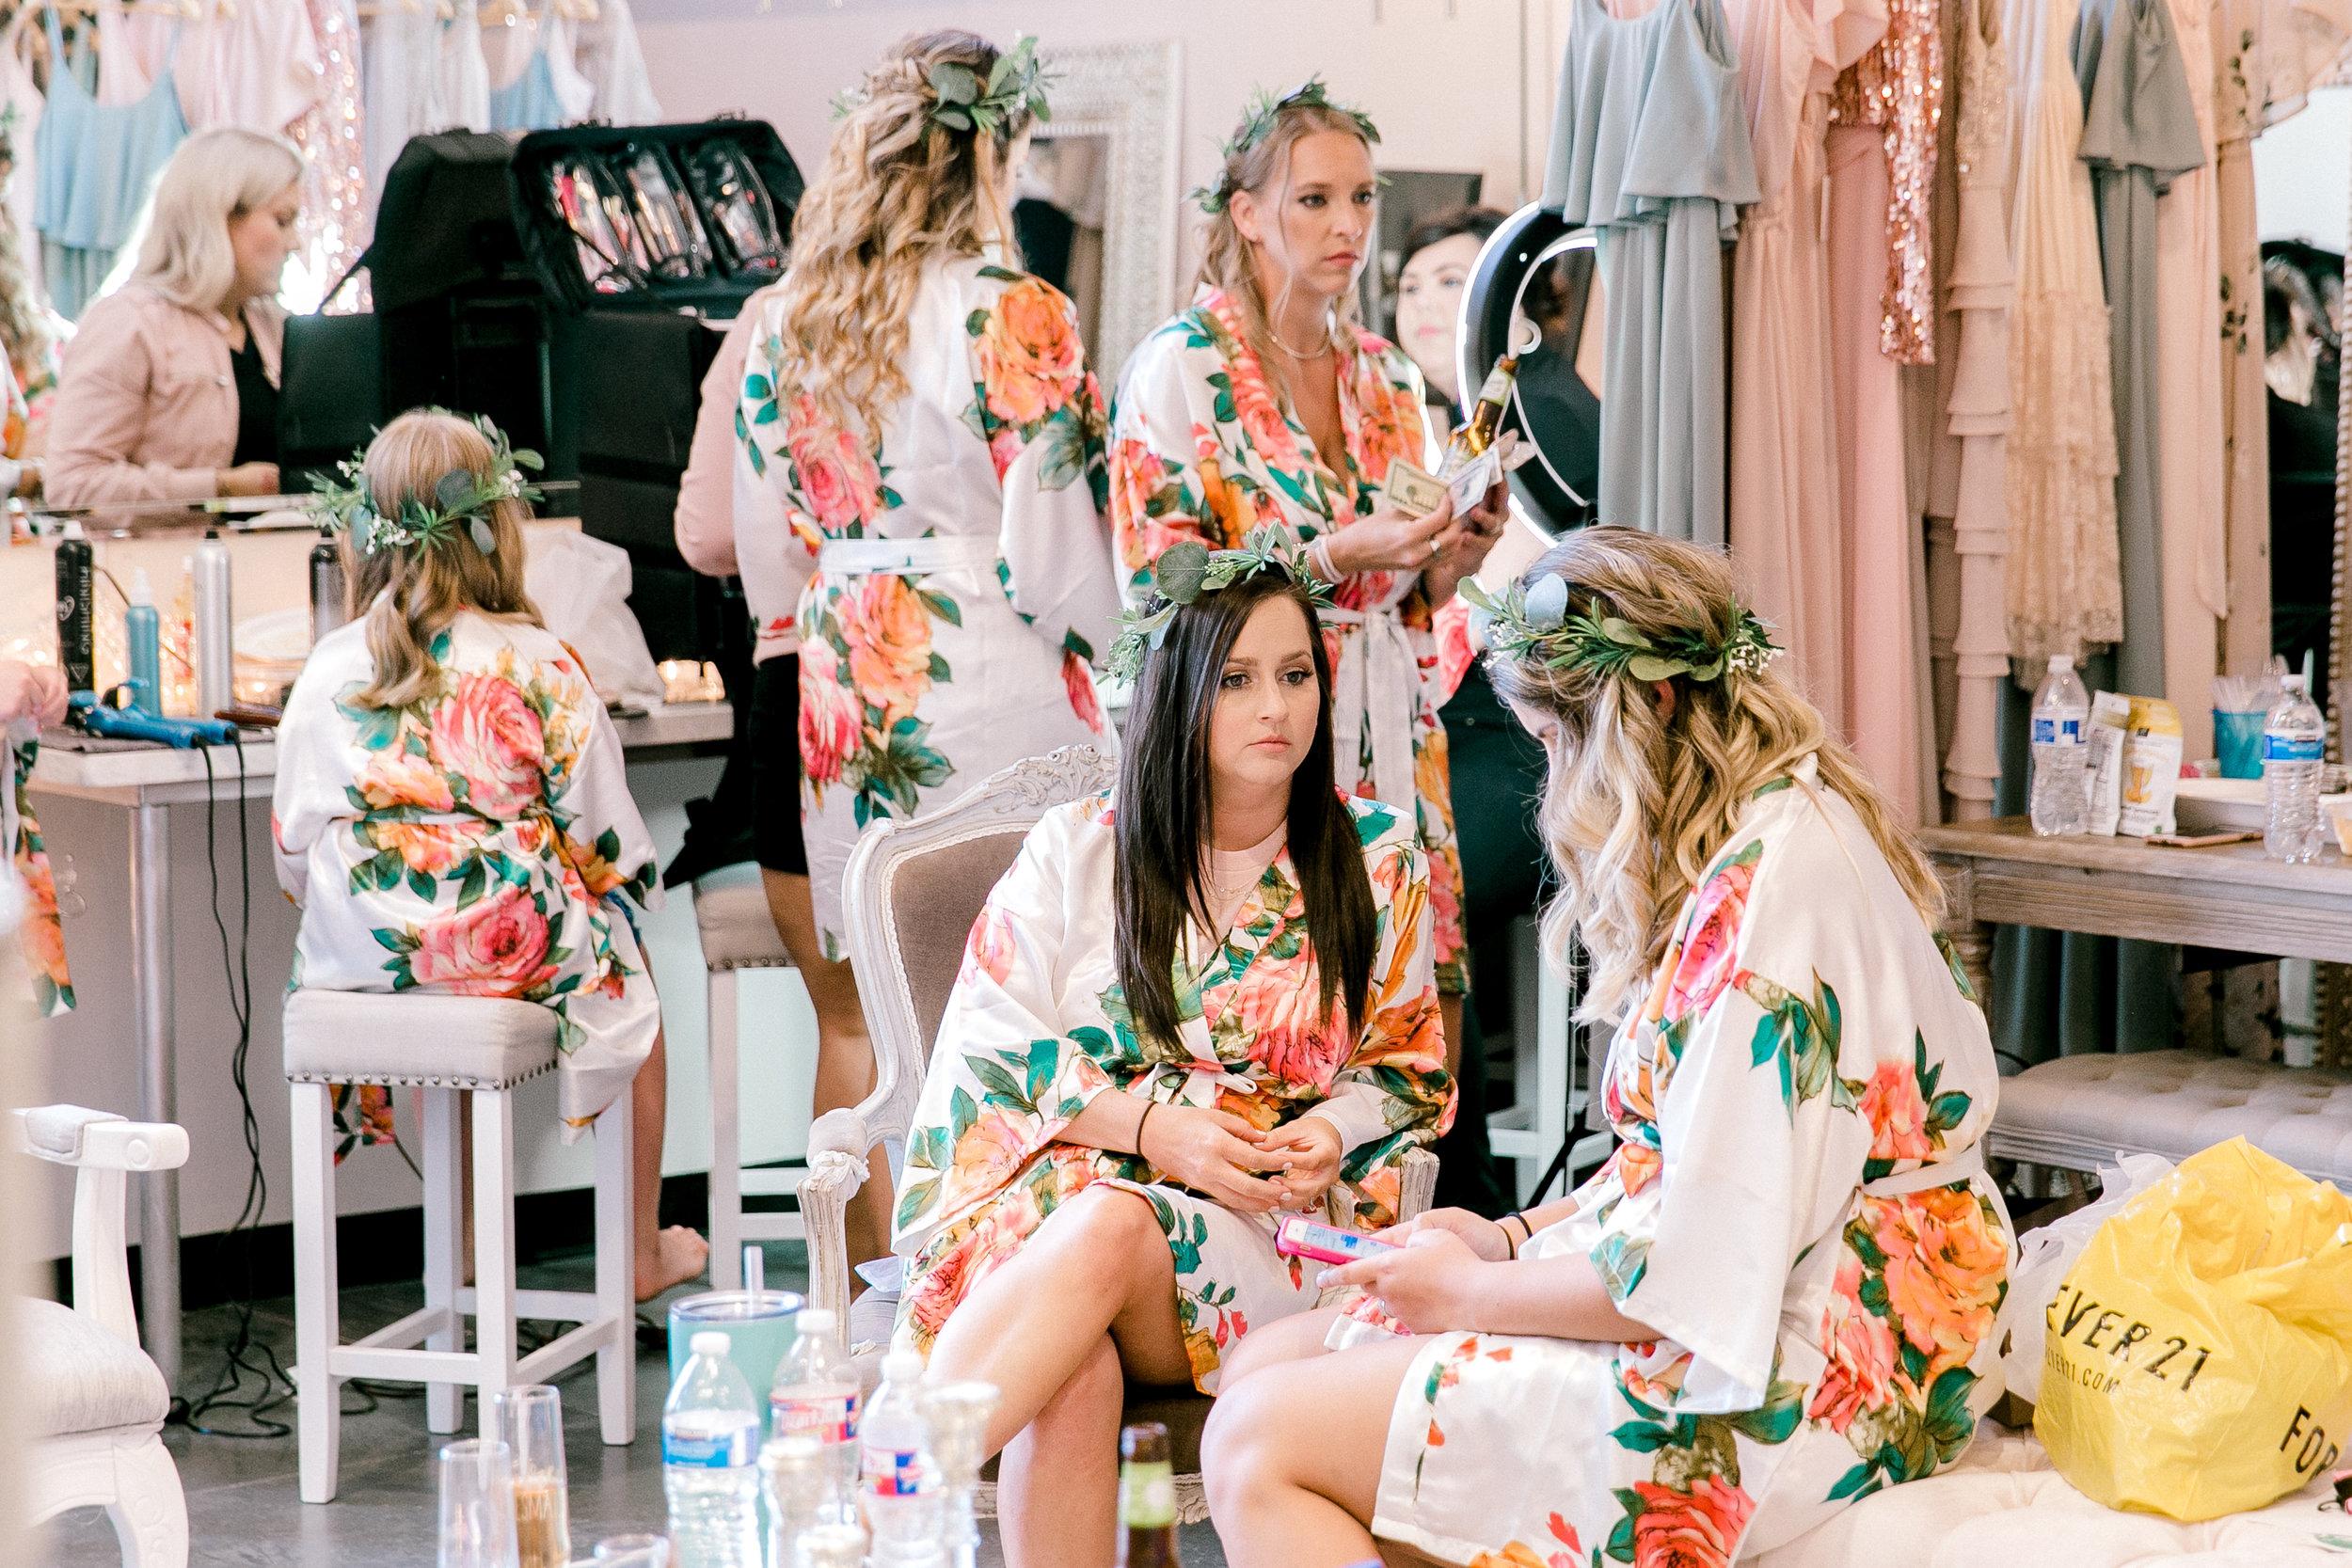 chandra_Madison Brandon Wedding-Pre Ceremony-0052.jpg